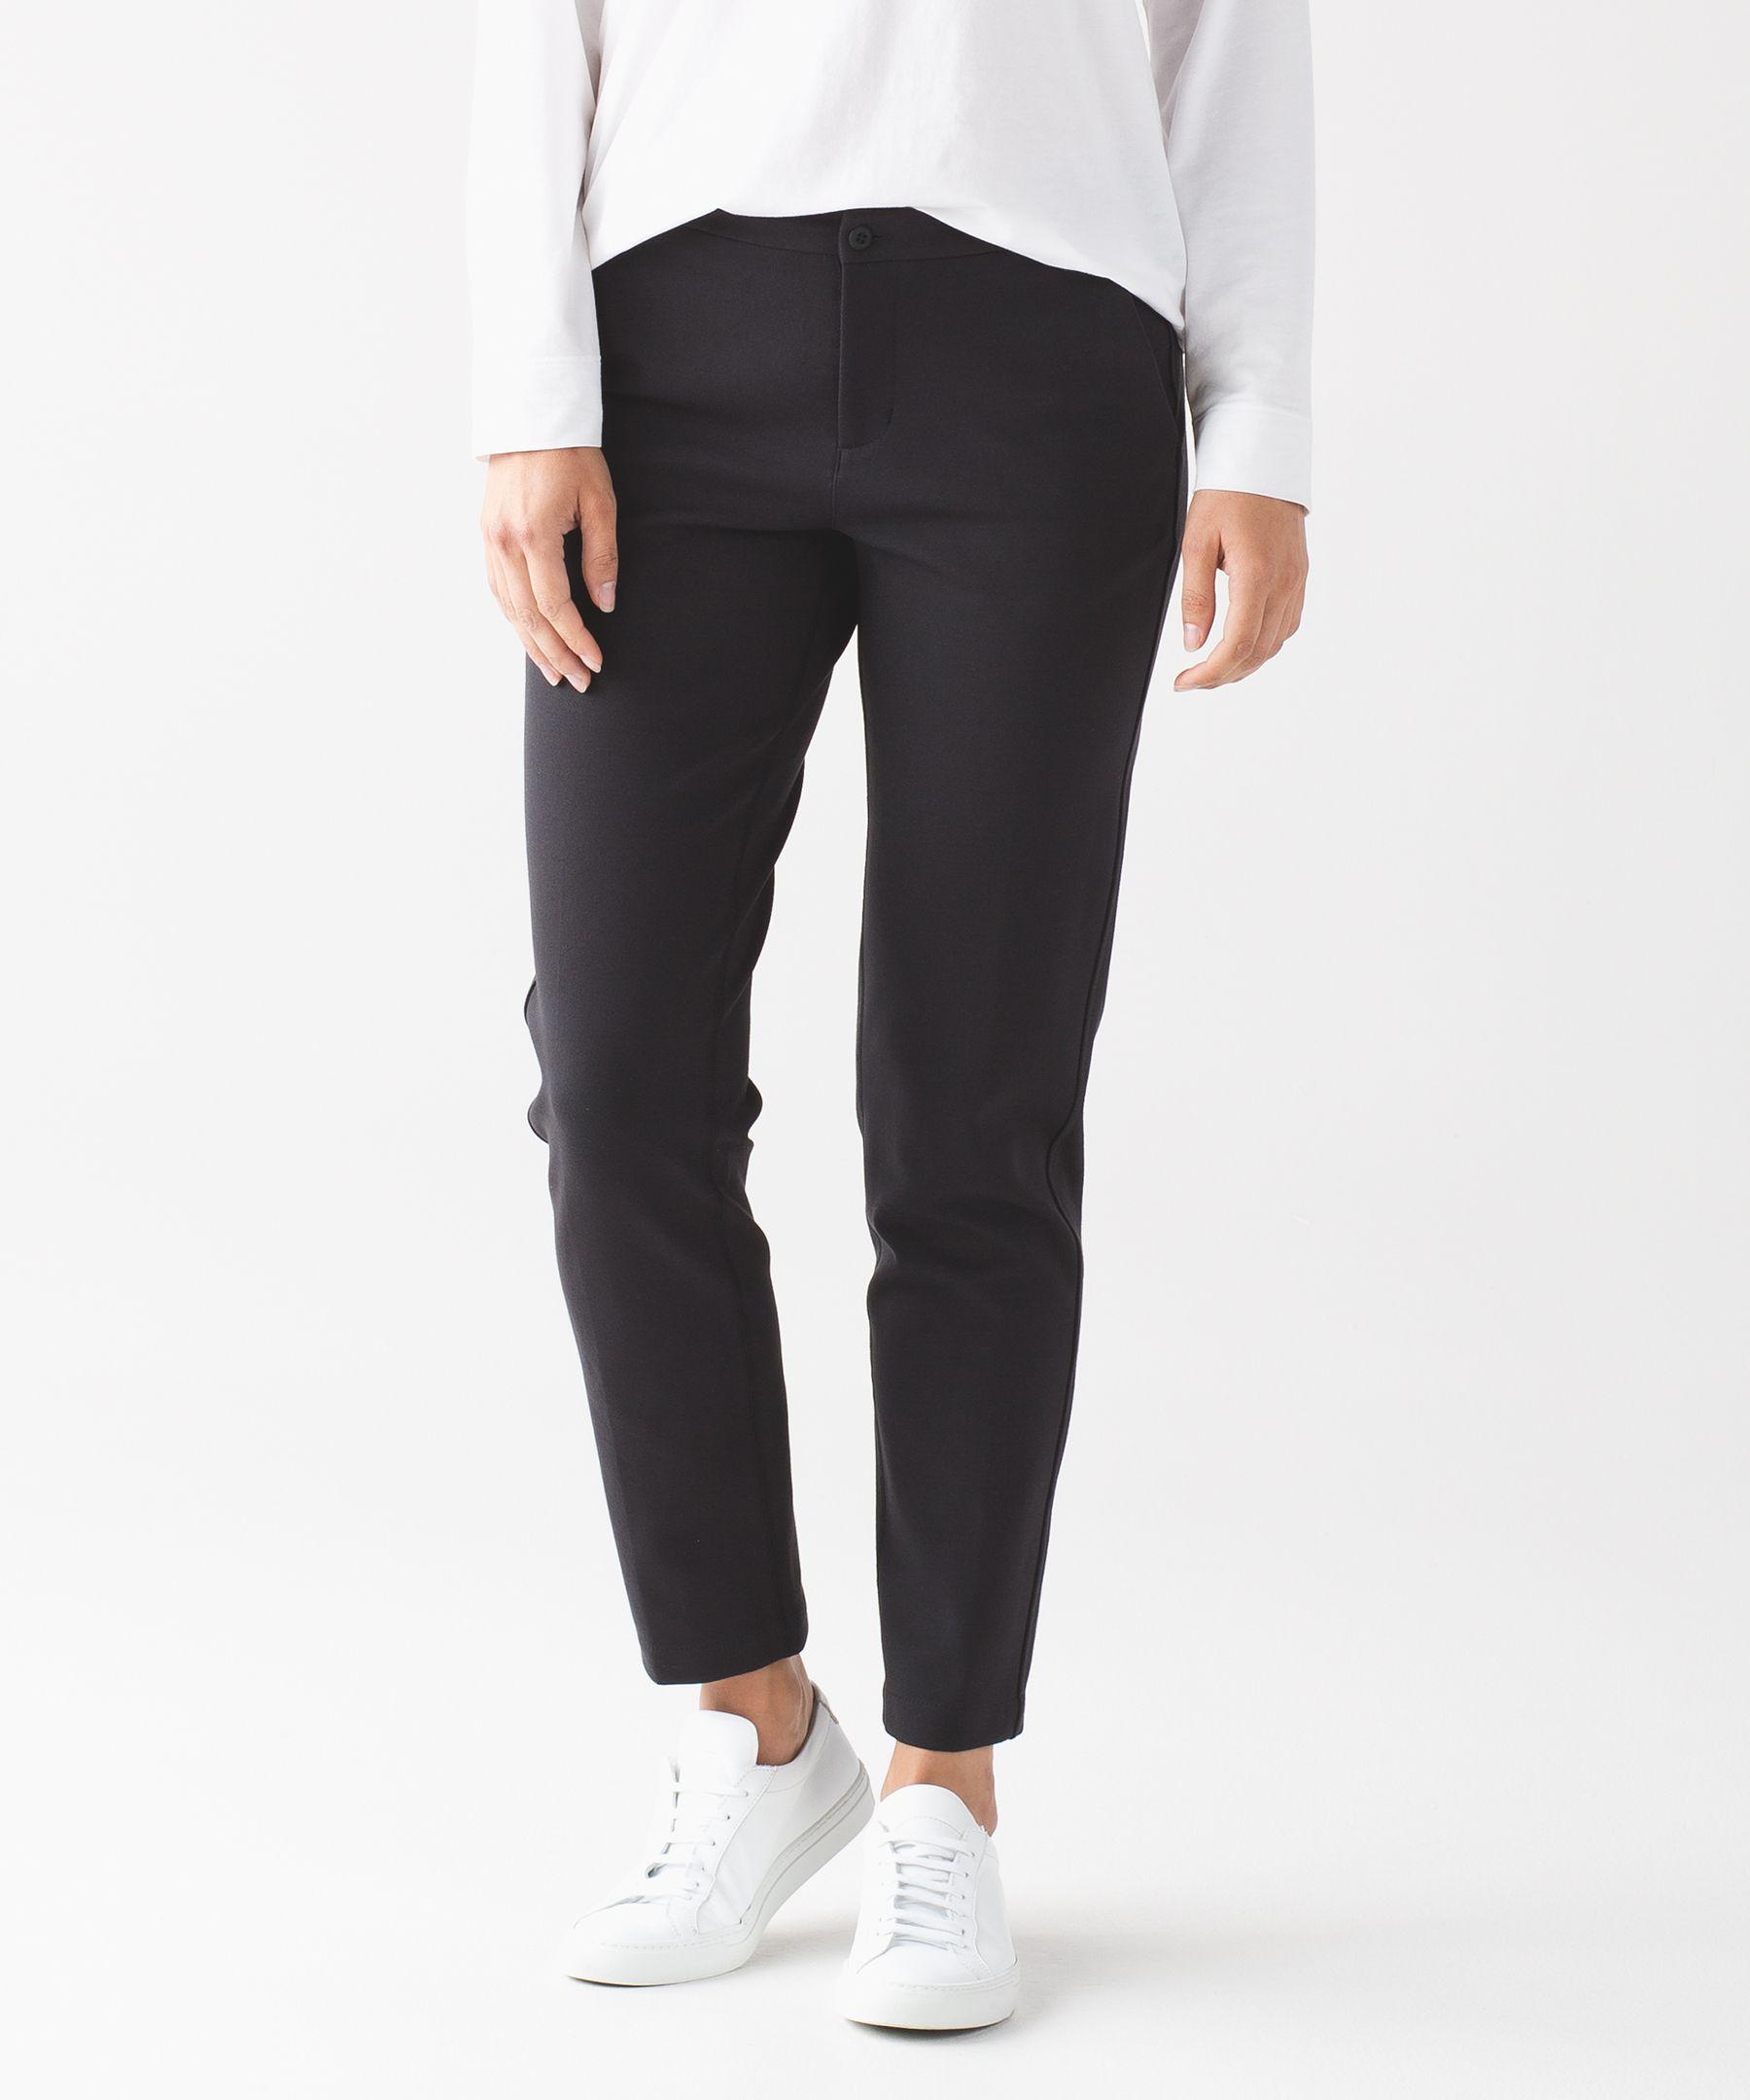 City Trek Trouser Ponte Women S Pants Lululemon Athletica